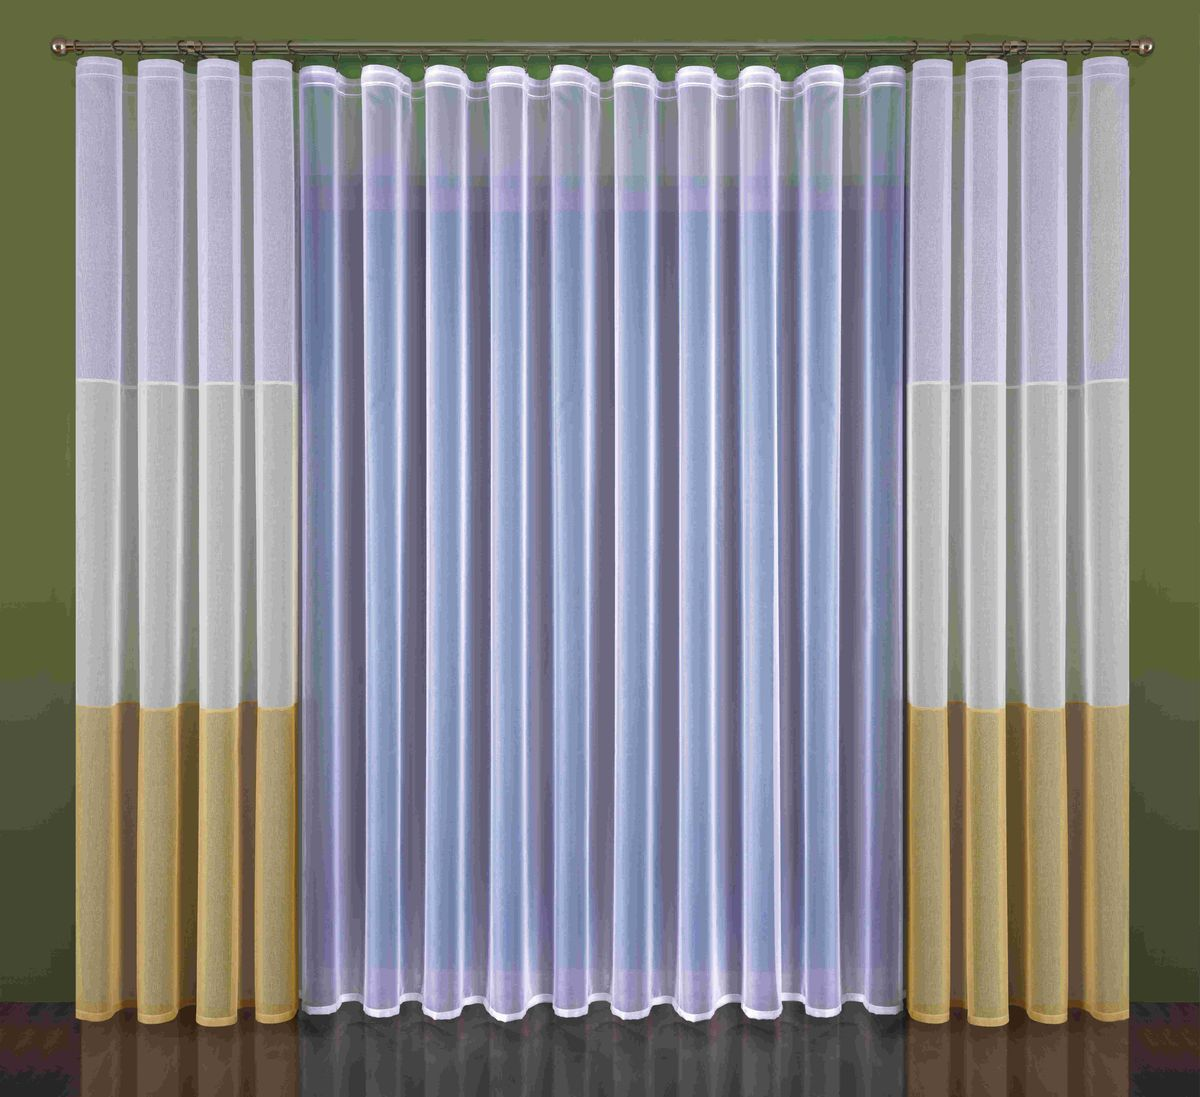 Комплект штор Wisan Kleonia, на ленте, цвет: белый, бежевый, высота 250 см комплект штор wisan lara на ленте цвет оранжевый белый высота 250 см